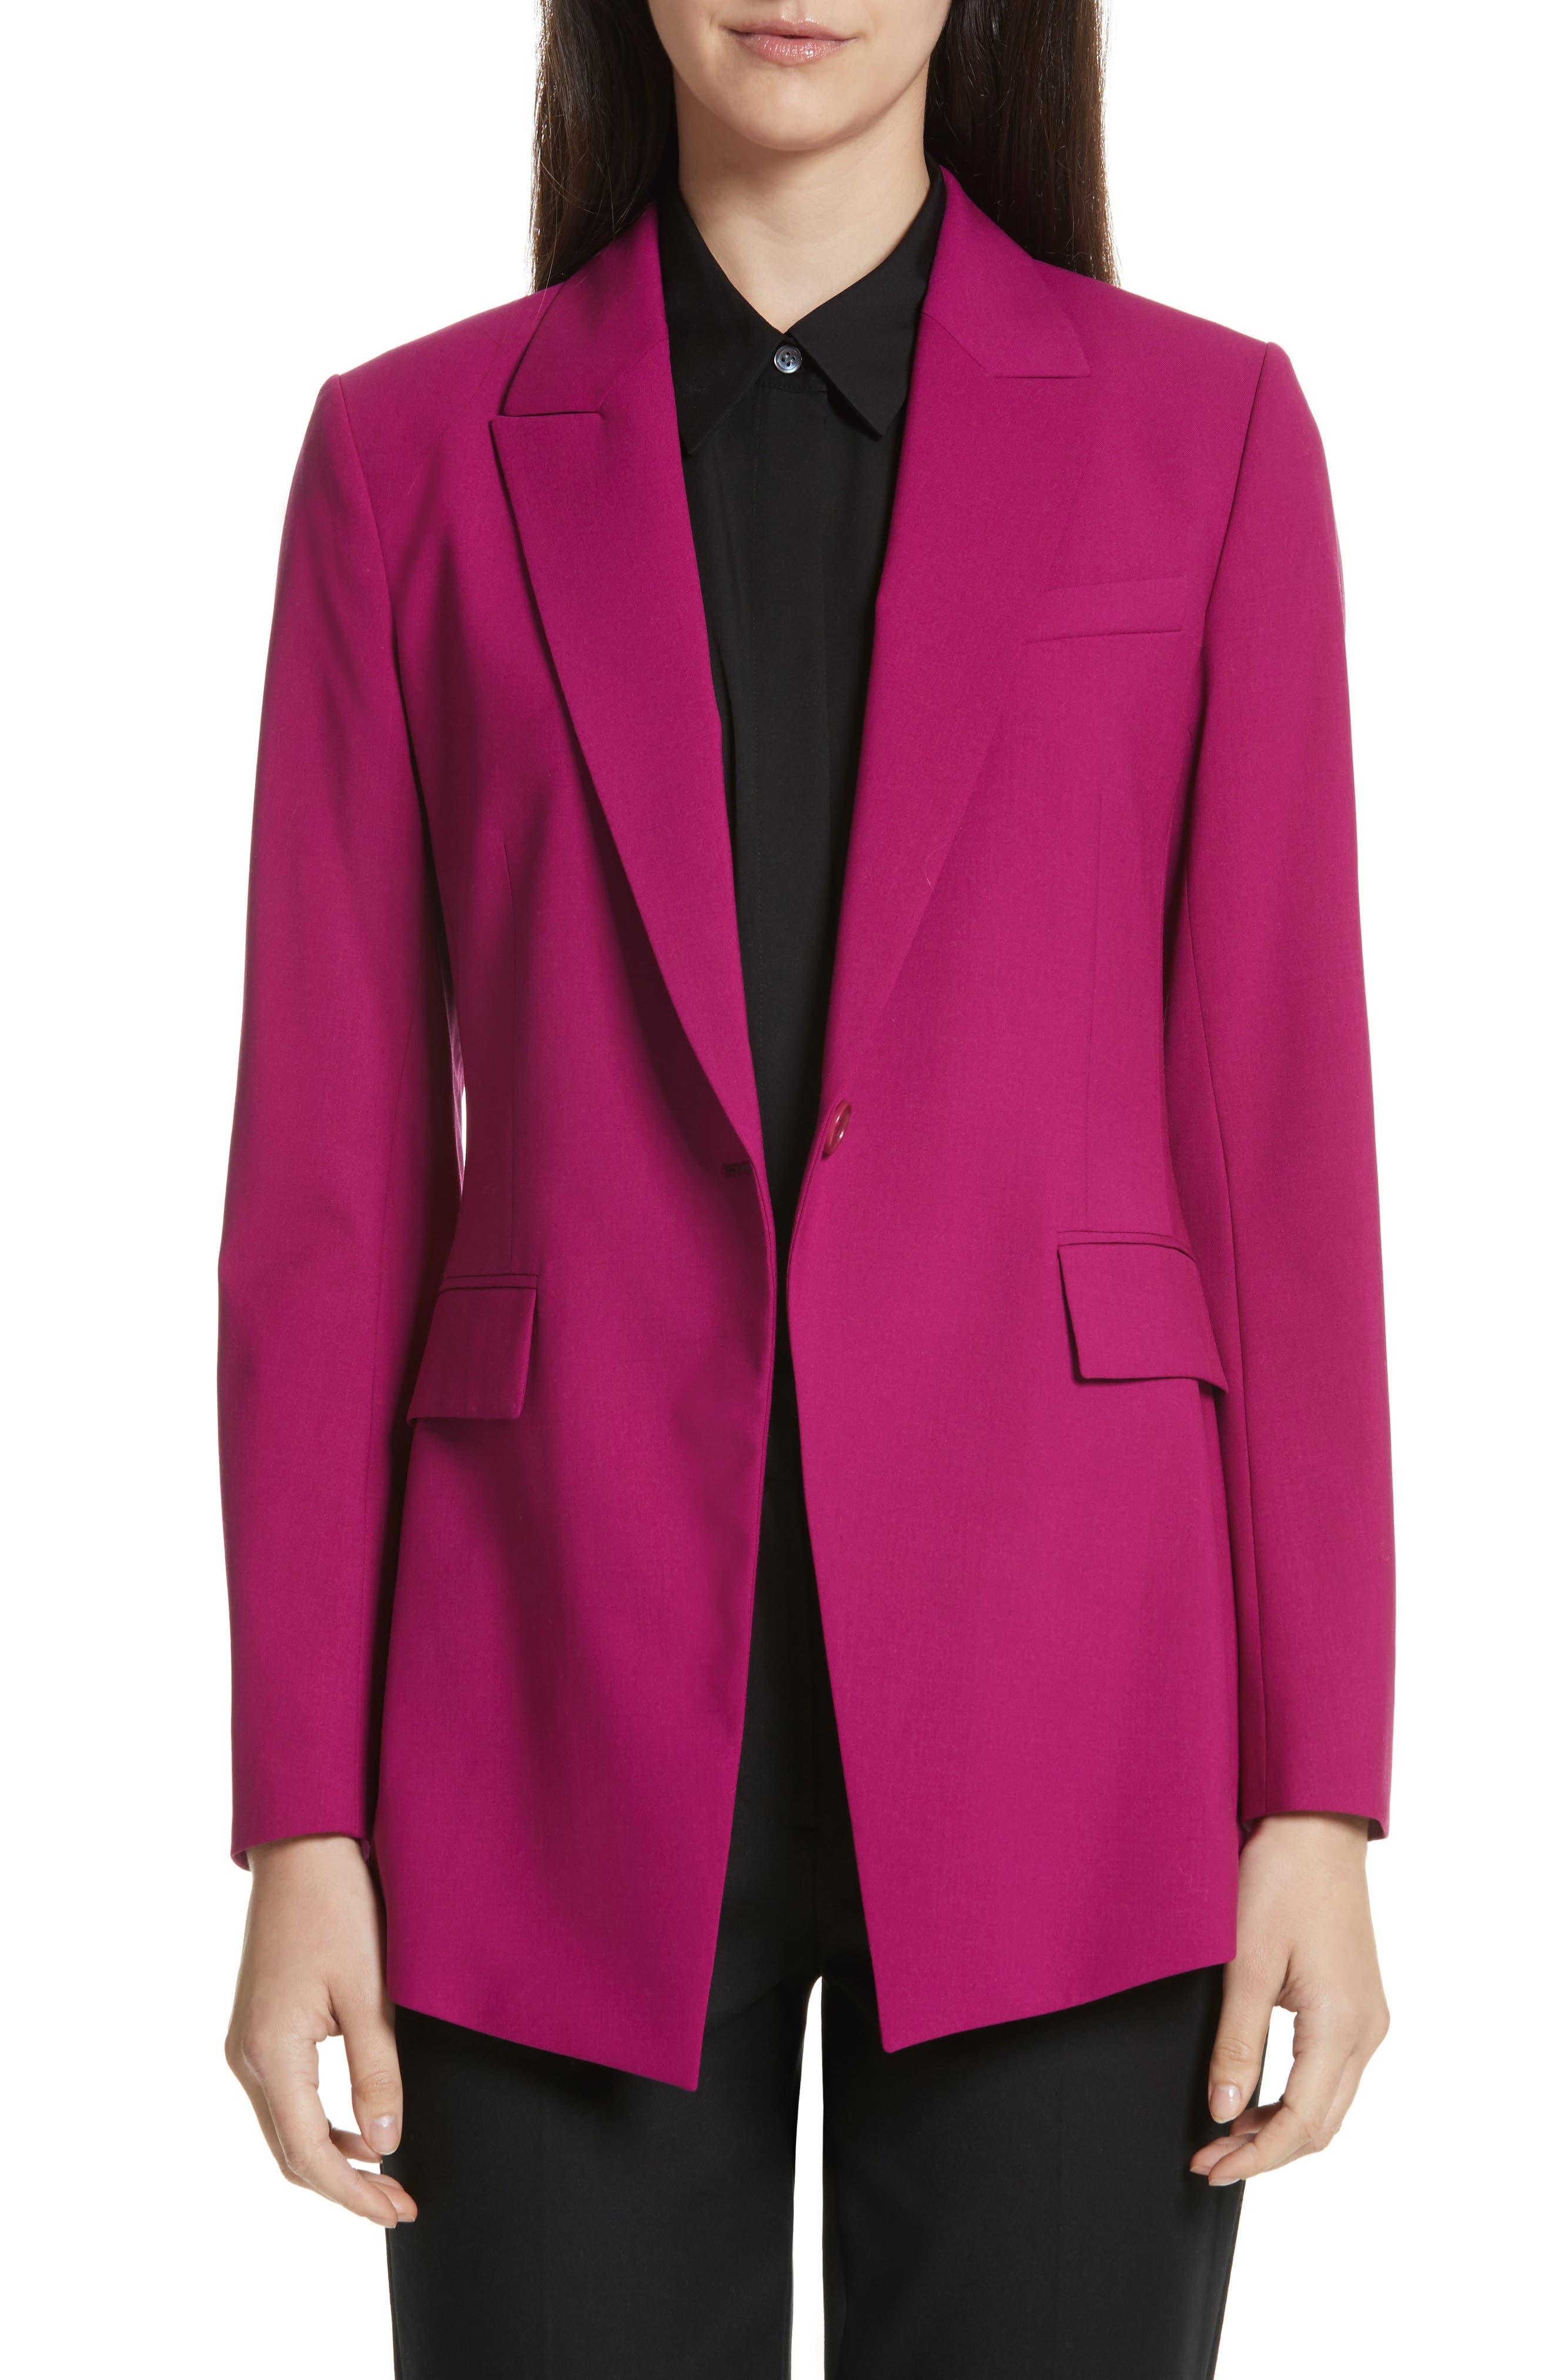 Main Image - Theory Etienette B Good Wool Suit Jacket